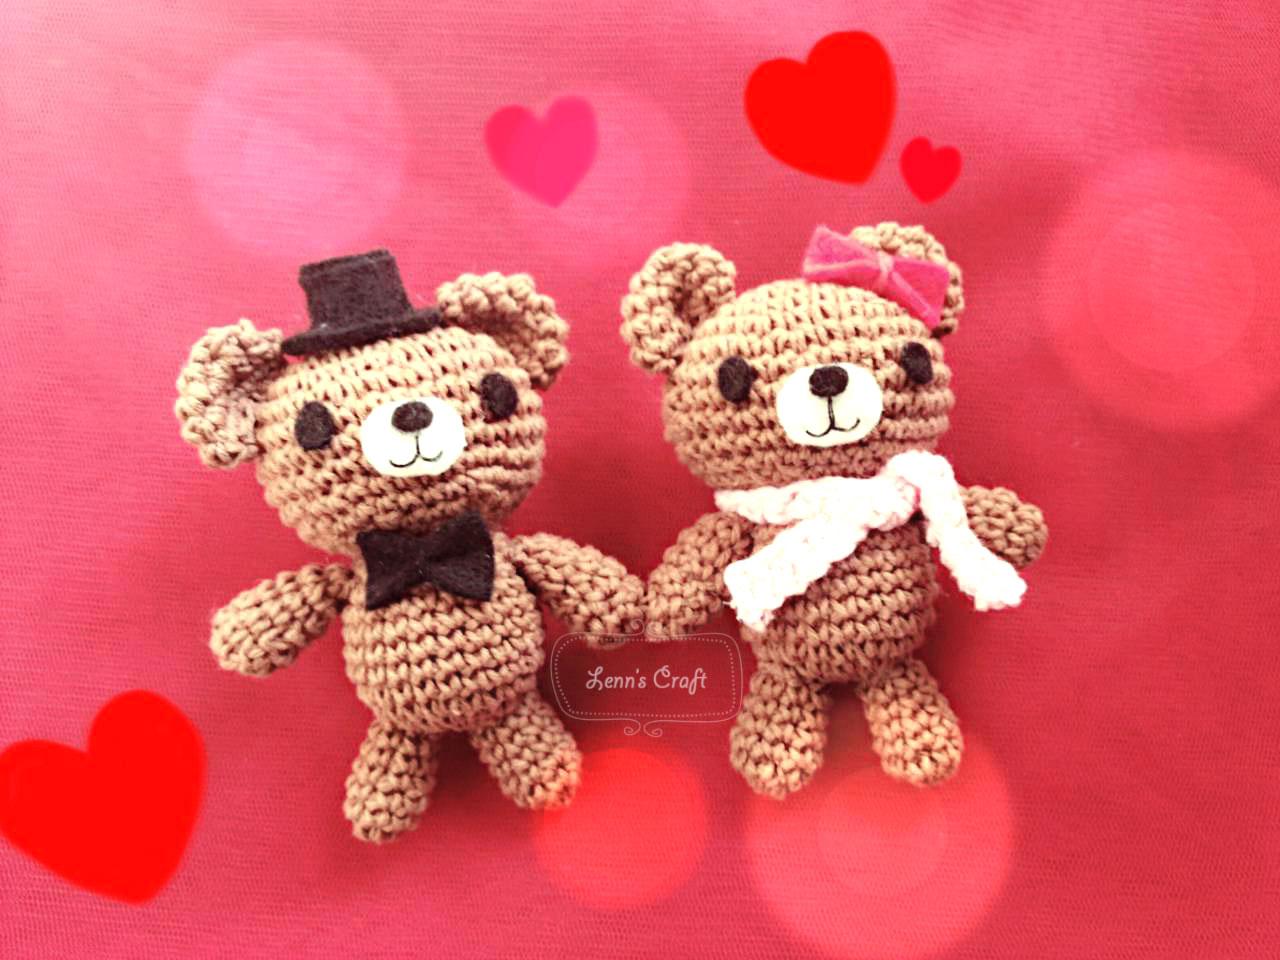 Amigurumi Boneka : Lenn s craft handmade doll amigurumi jual gantungan